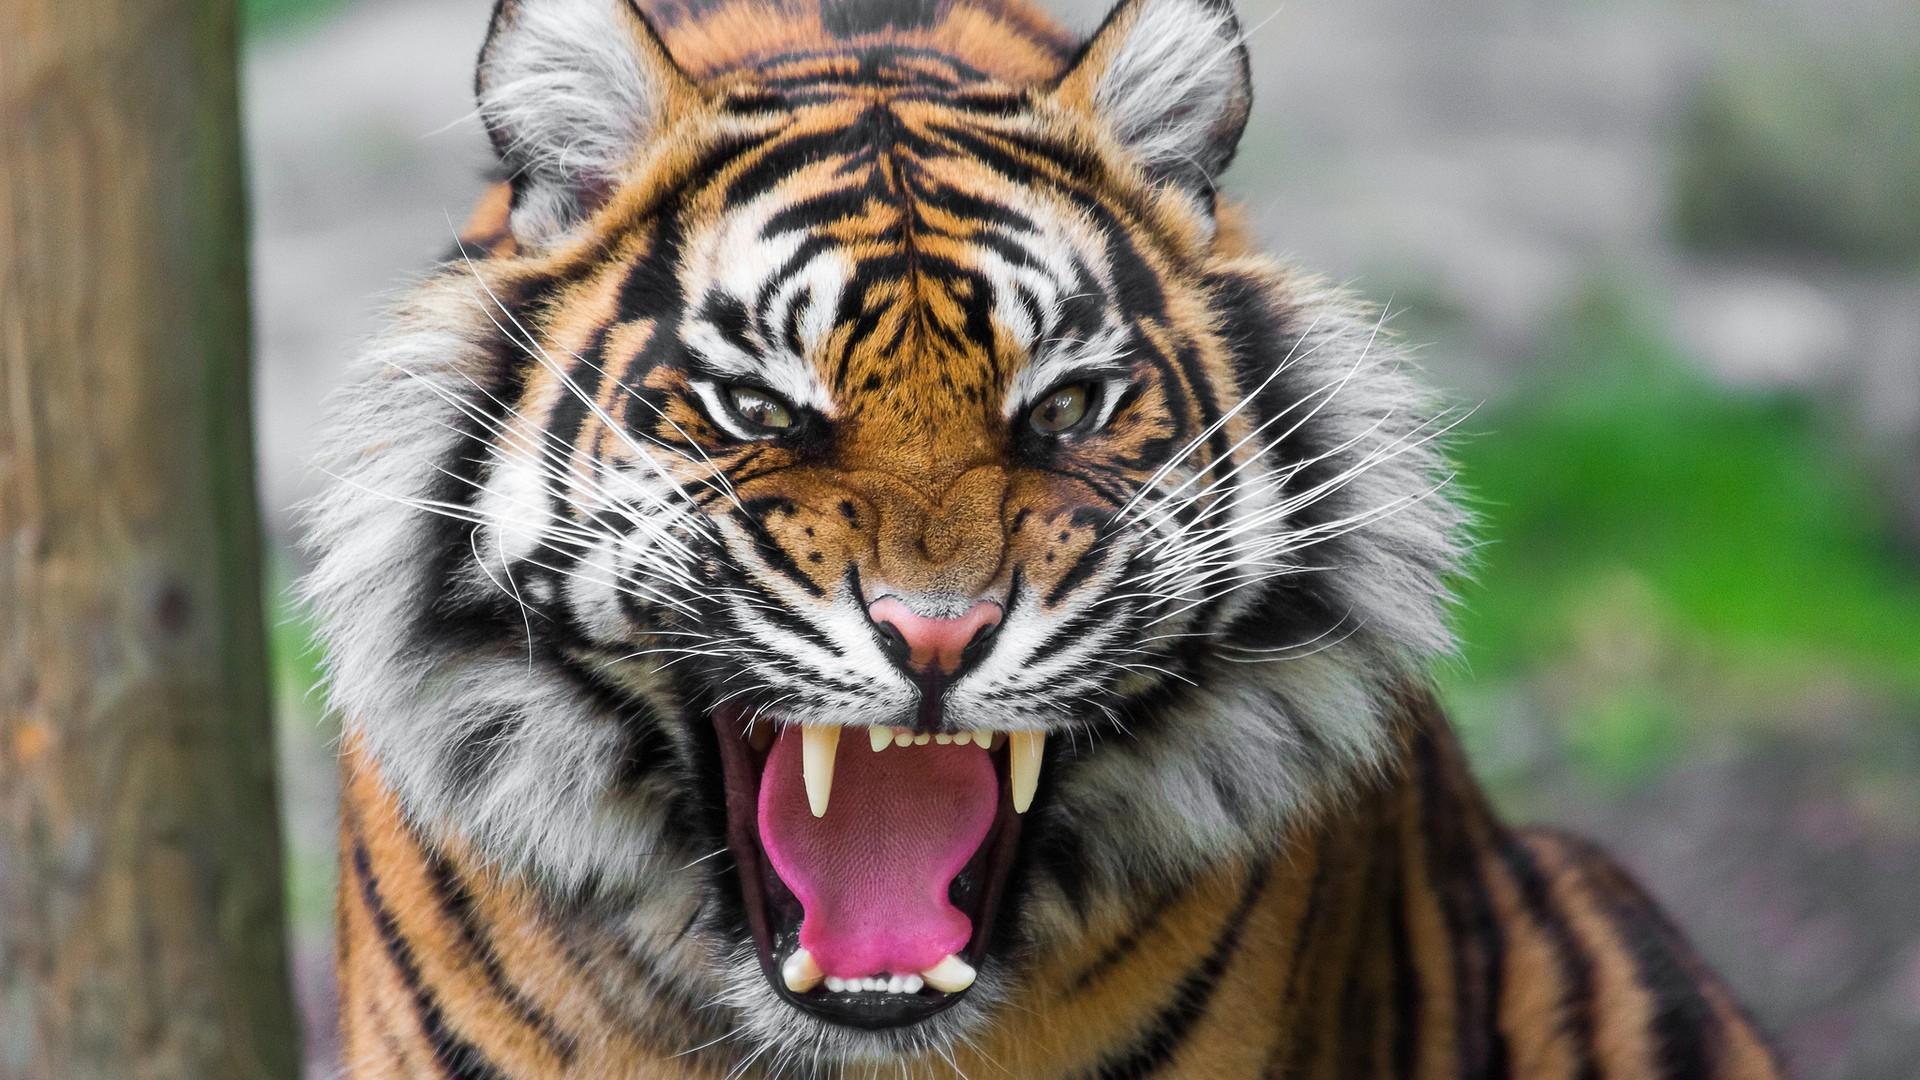 Full HD 1080p Tiger Wallpapers HD, Desktop Backgrounds 1920x1080